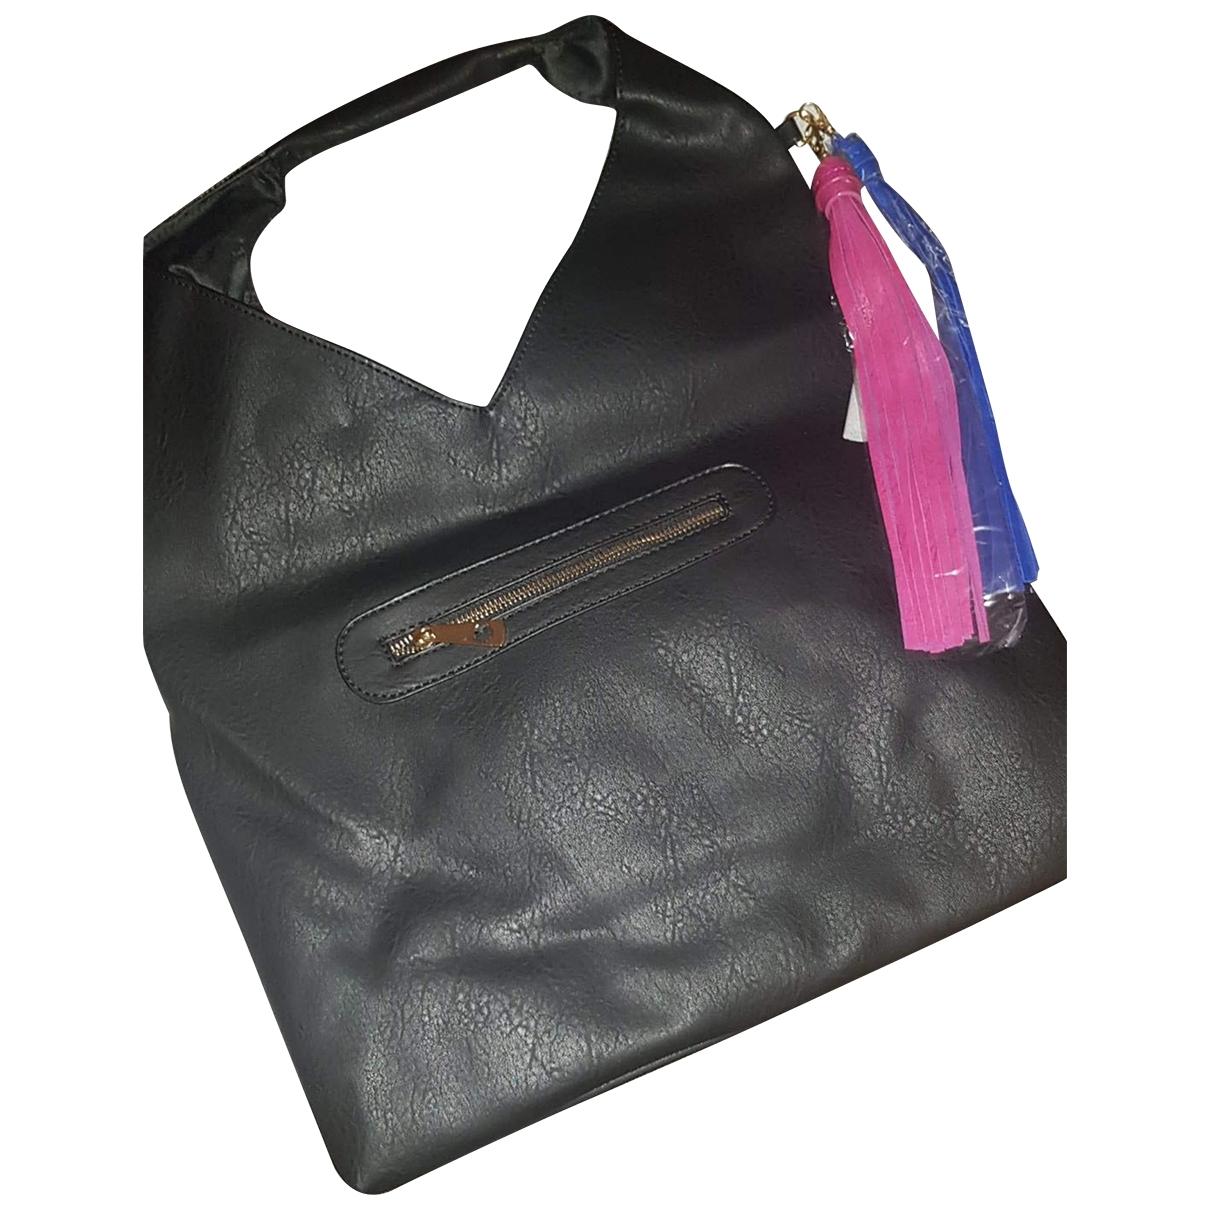 Asos \N Handtasche in  Schwarz Leder